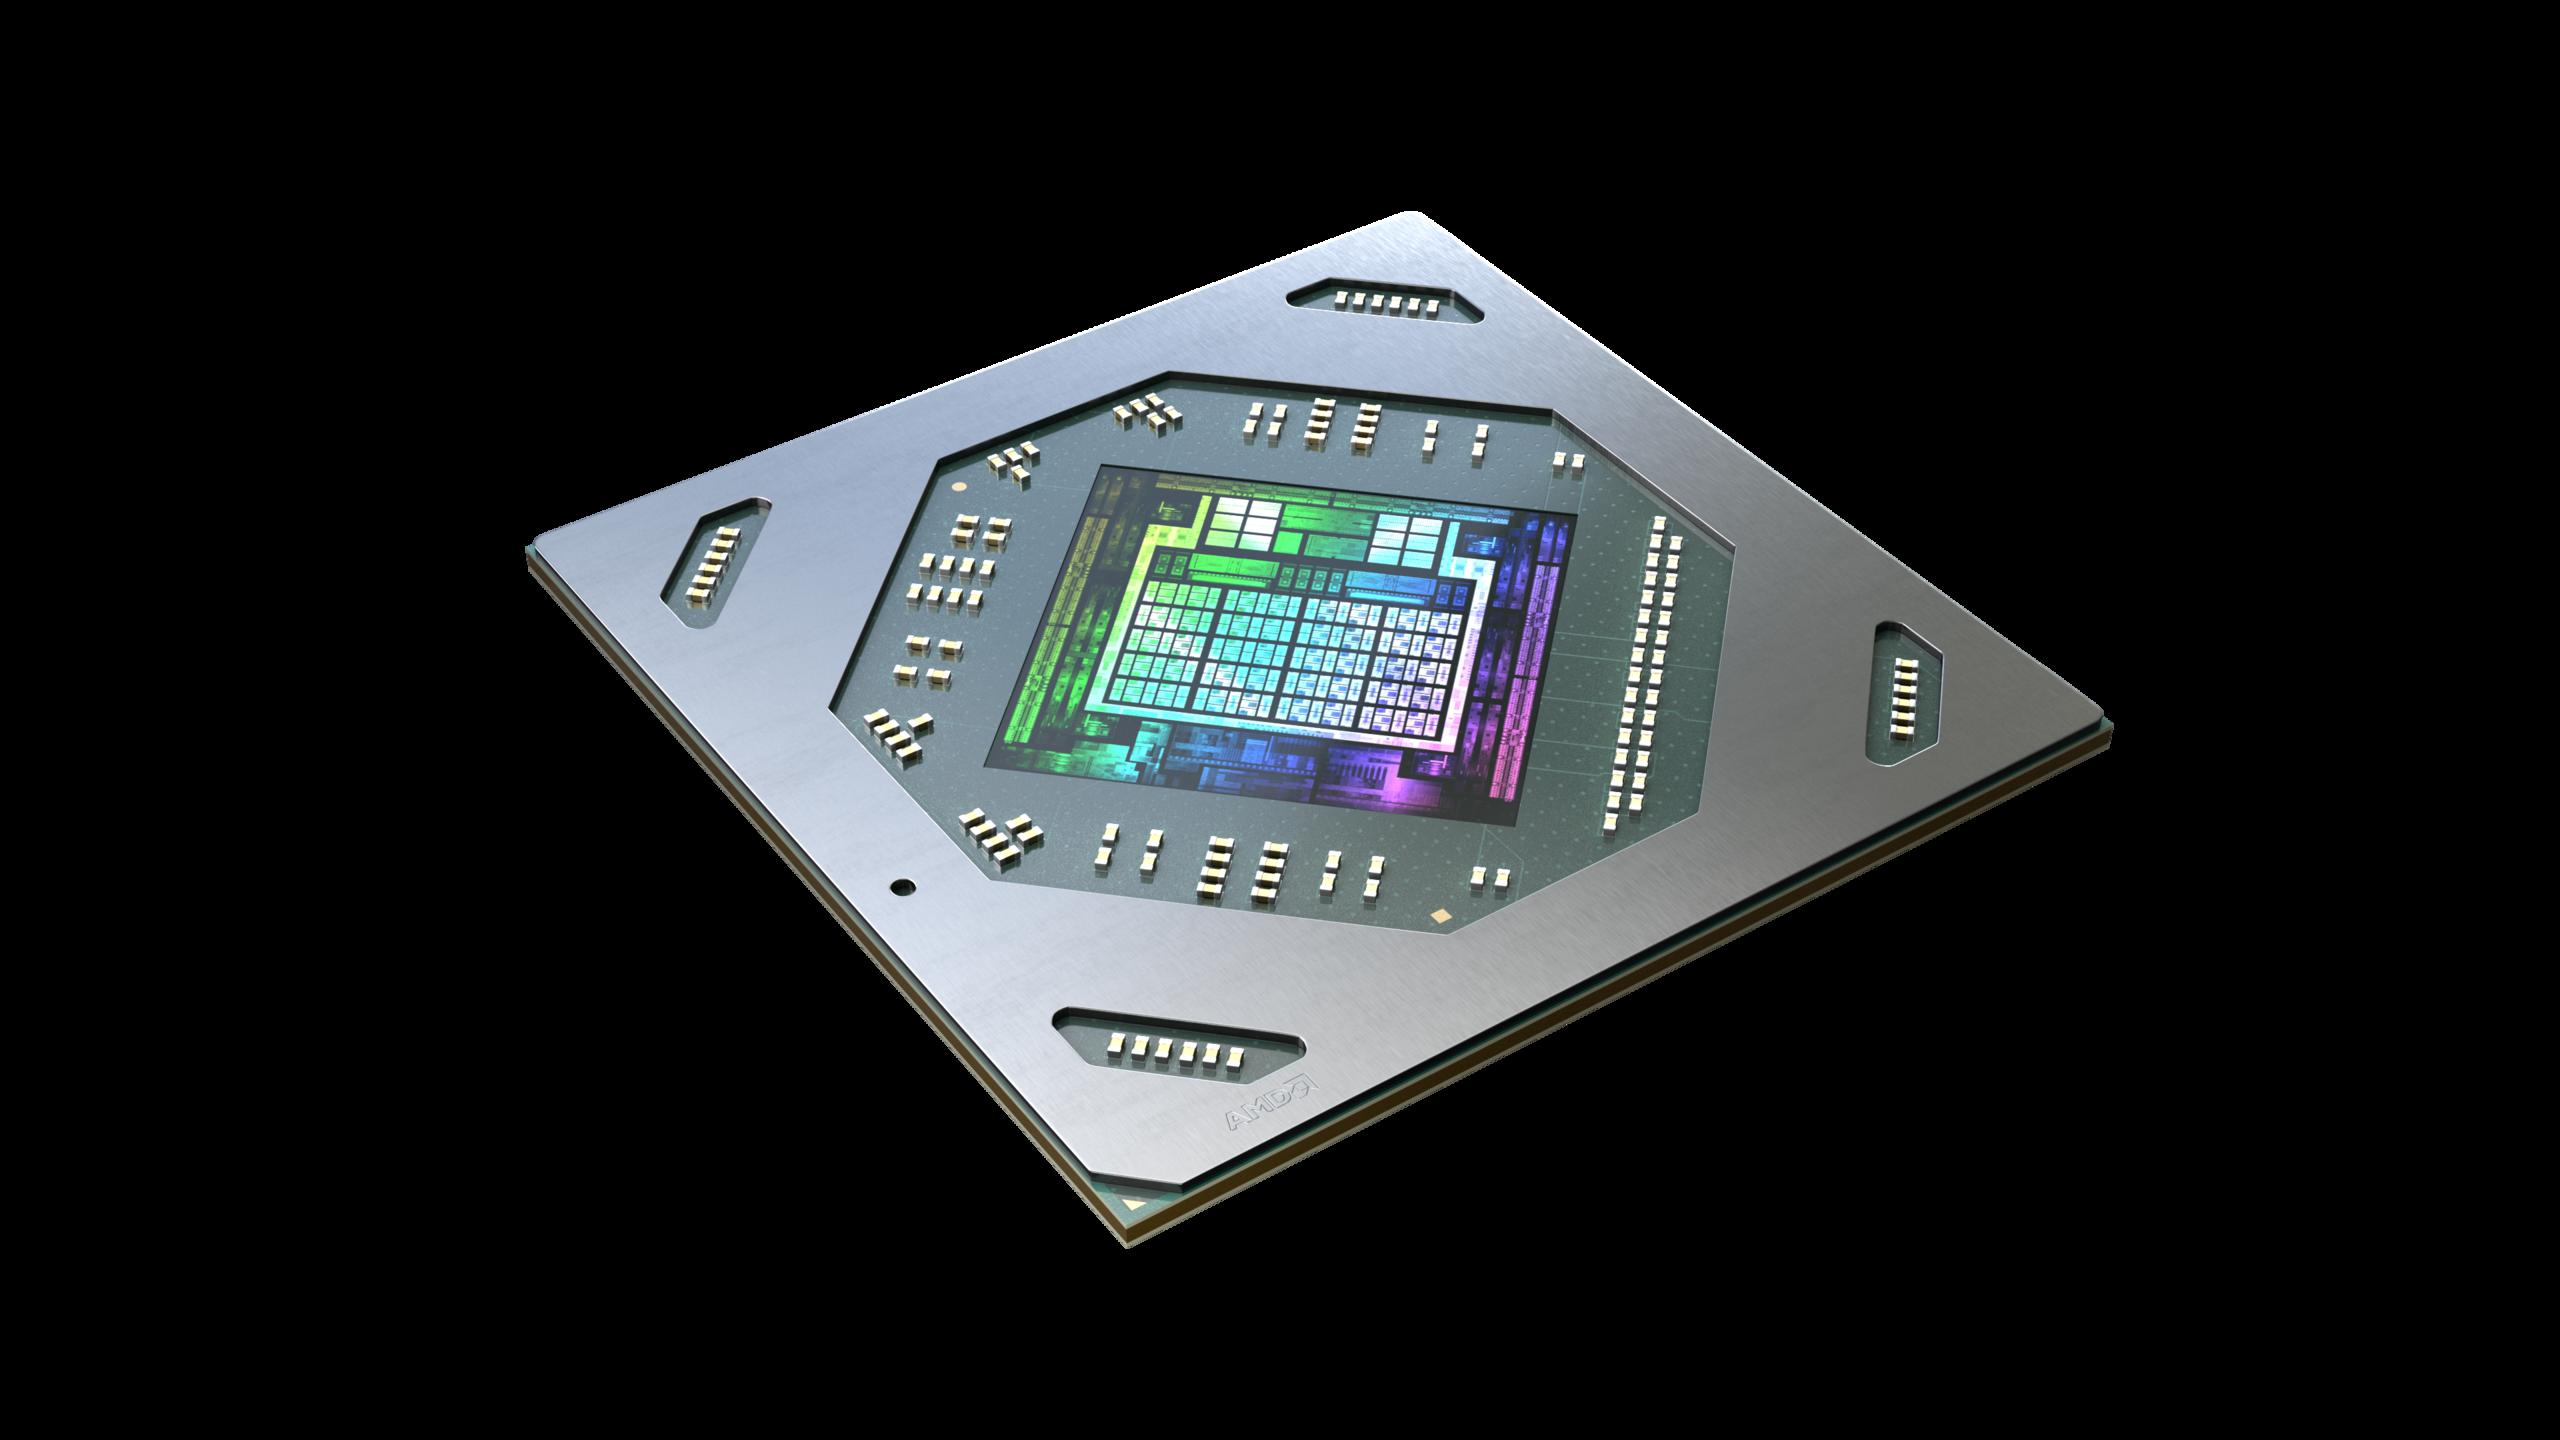 В видеокартах AMD Radeon RX 7600 / RX 7500 могут использоваться ГП Navi 2X